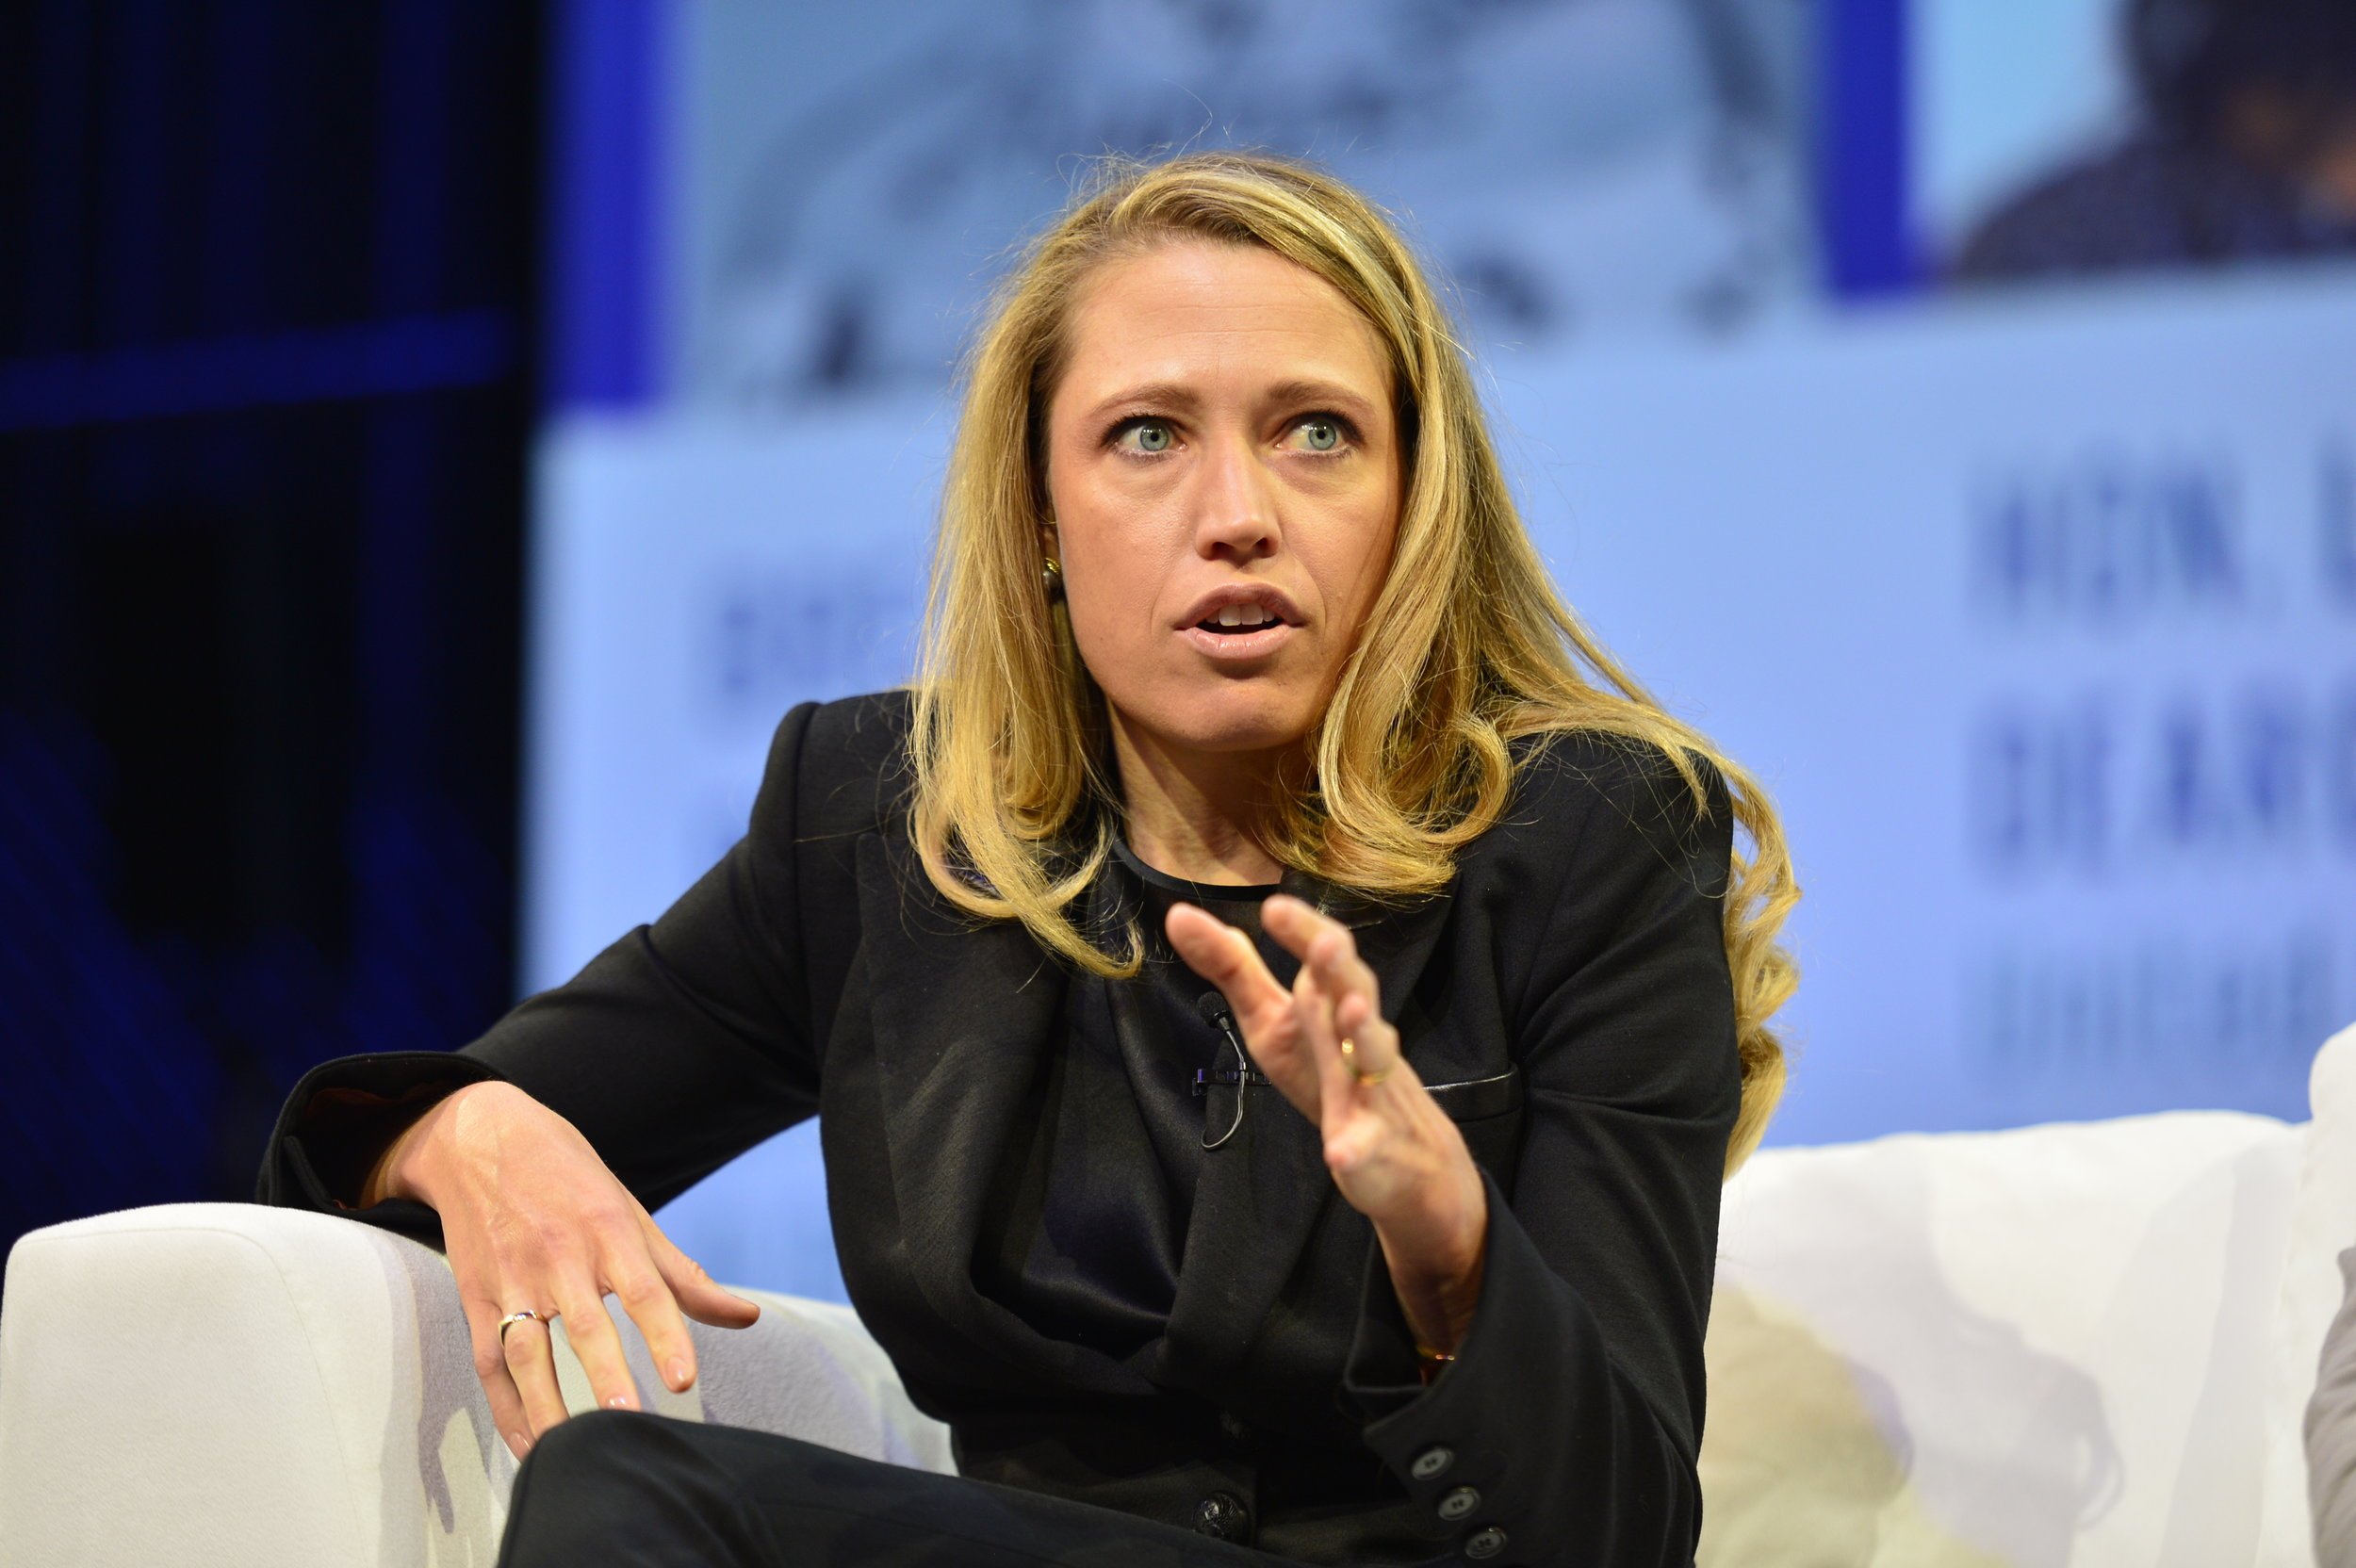 Tazia Smith - Managing Director, Deutsche Bank